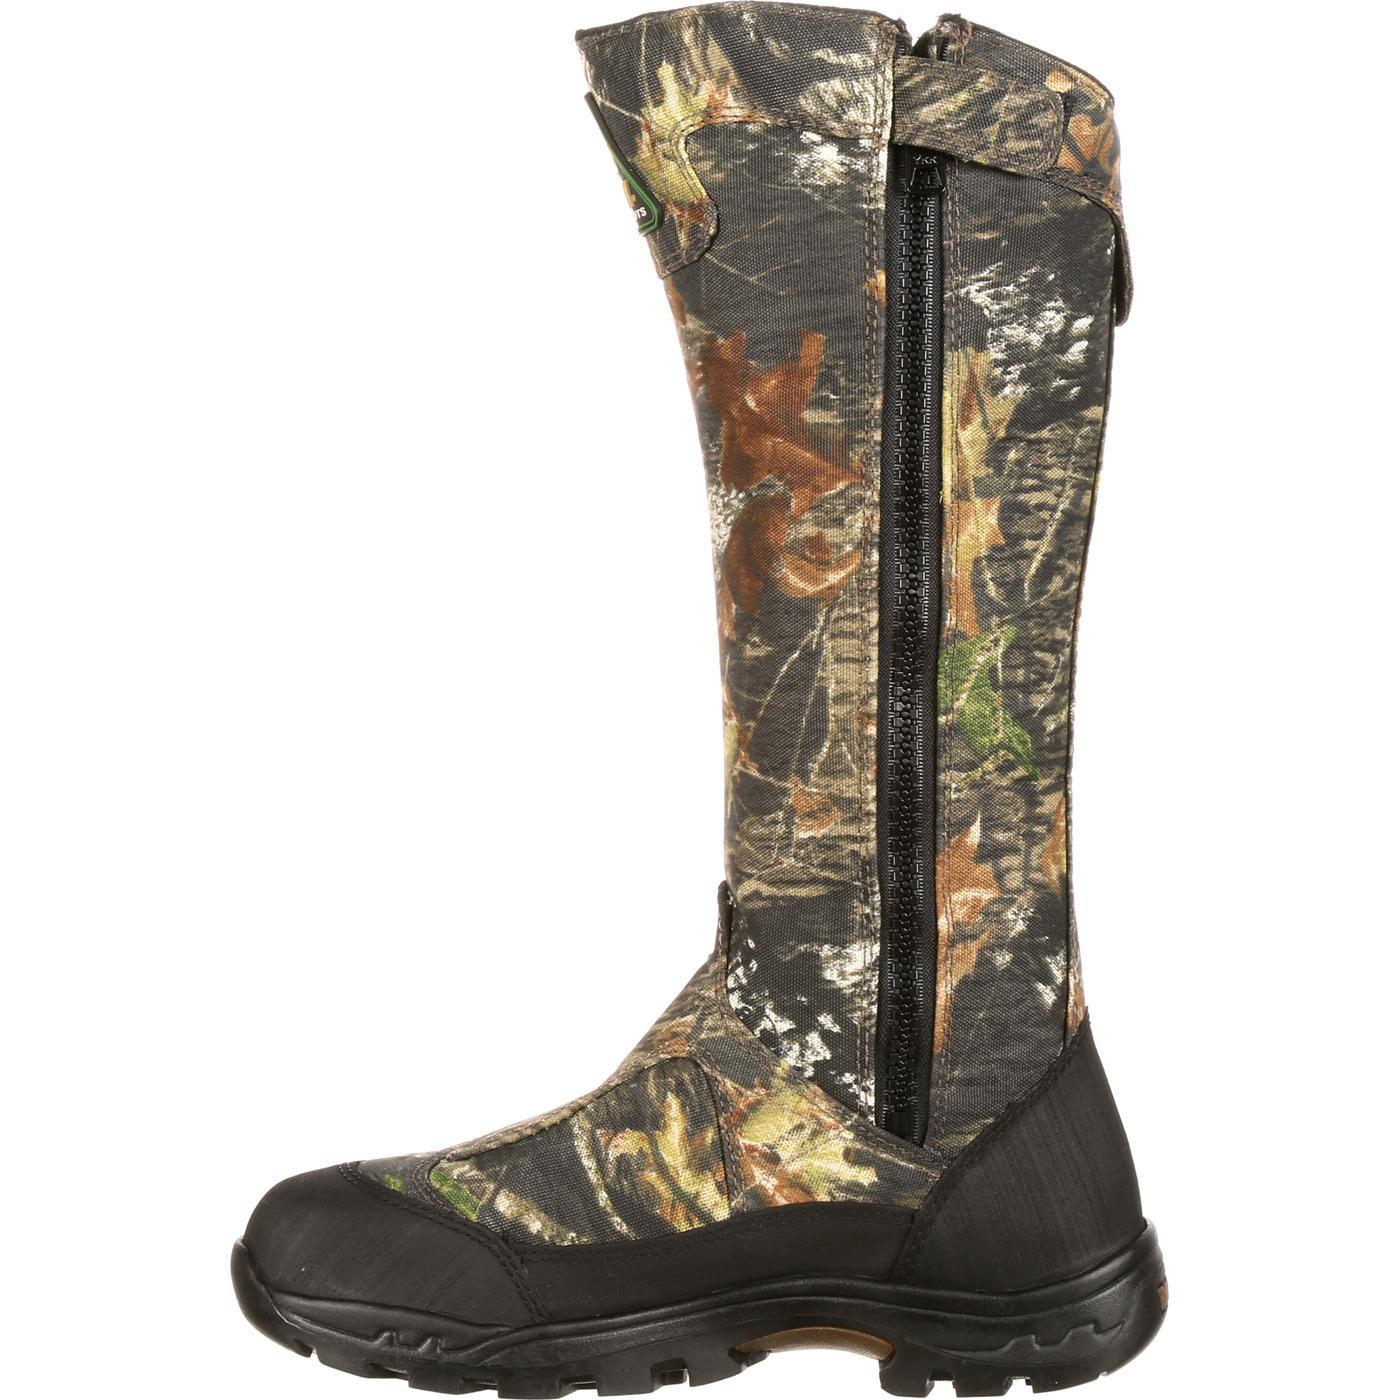 Rocky Prolight Waterproof Snakeproof Boot In Camo 1580